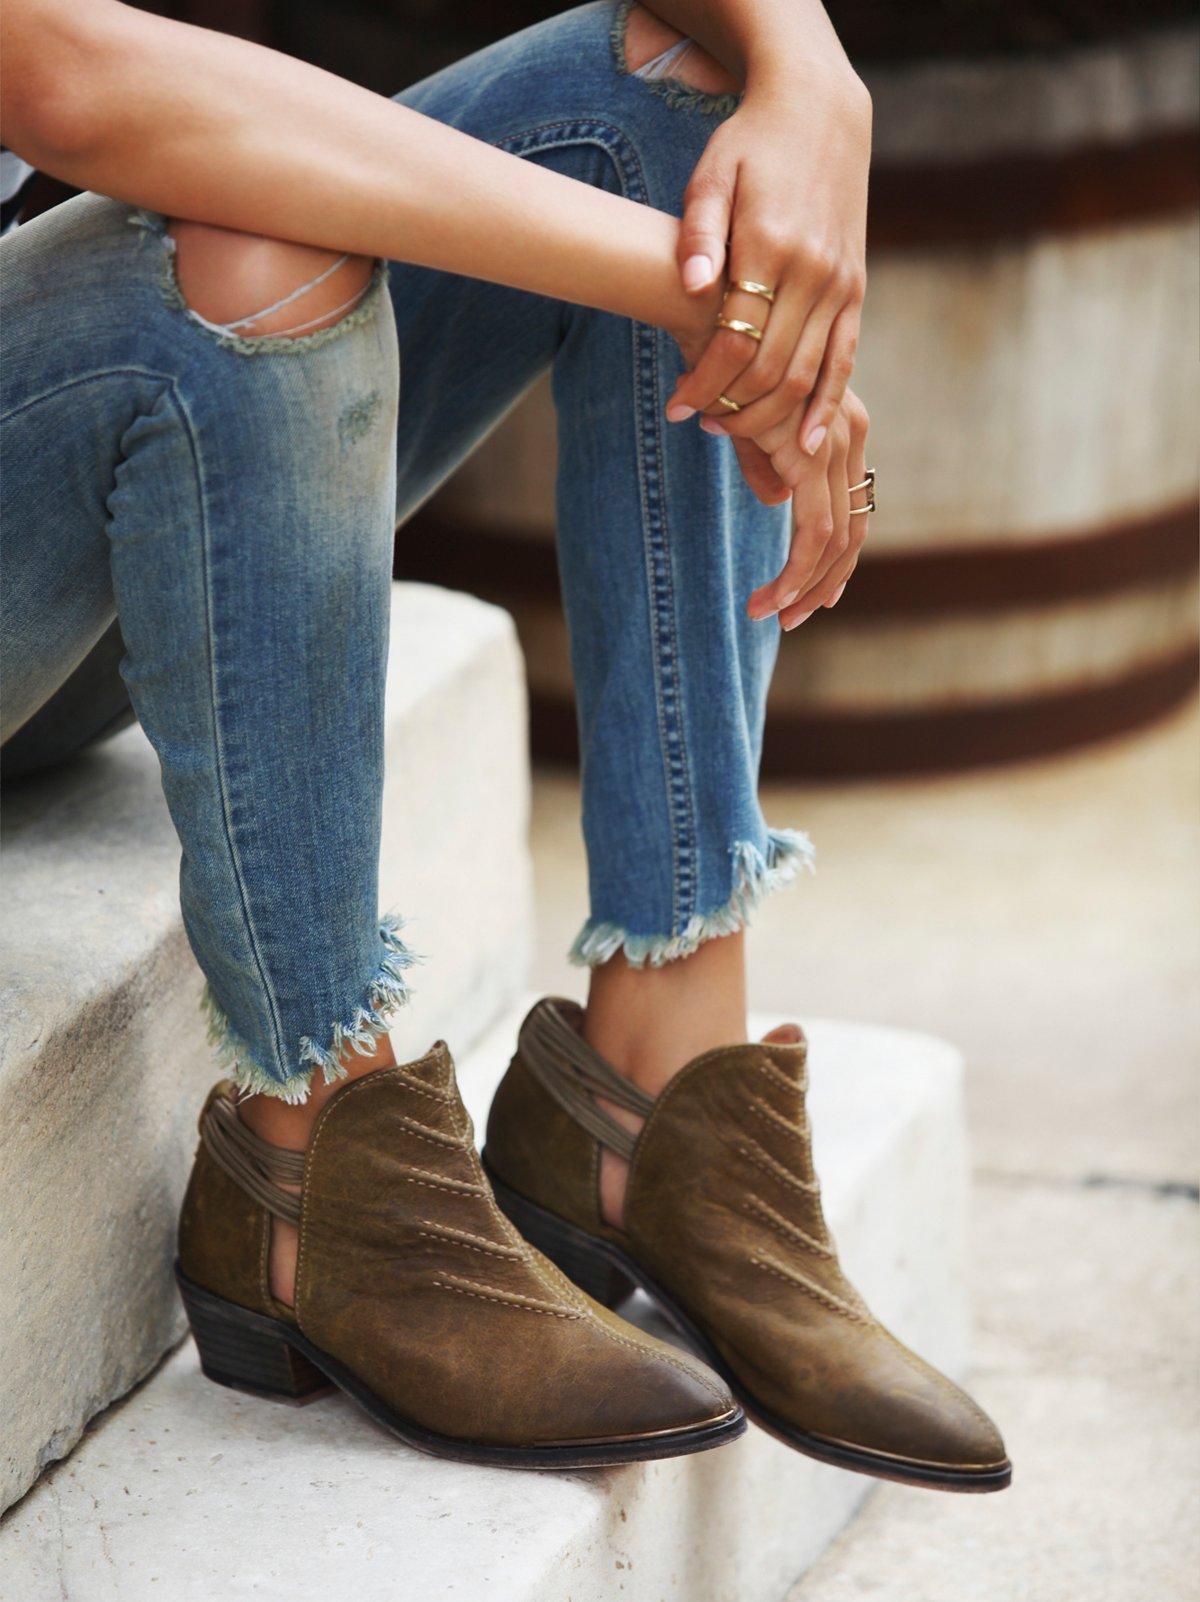 Southern Cross踝靴